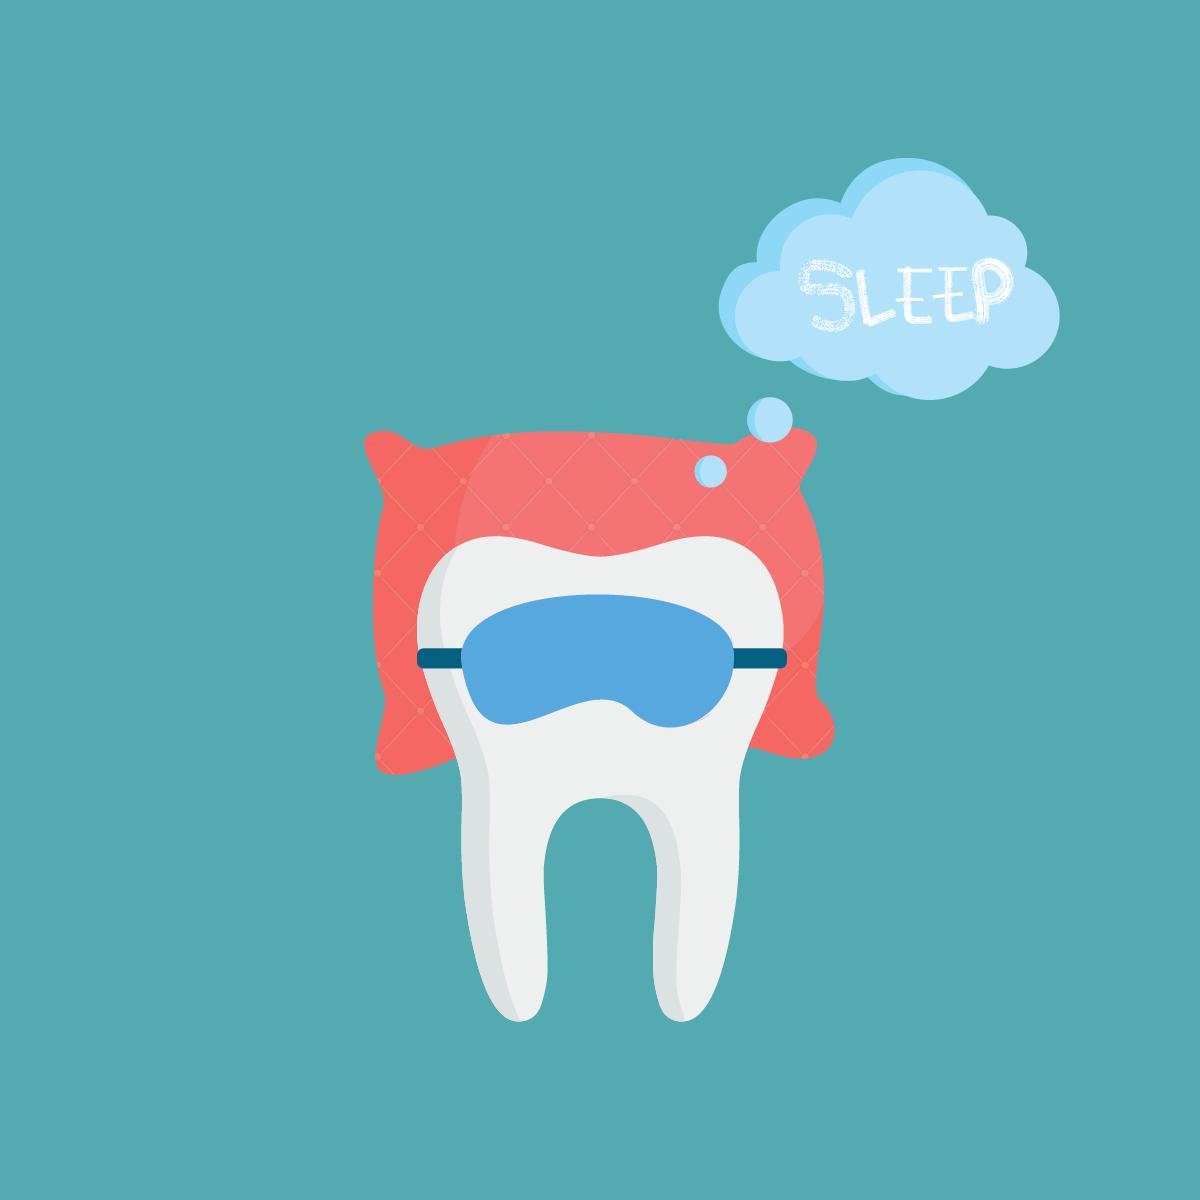 سلامت دندان و سلامت کل بدن